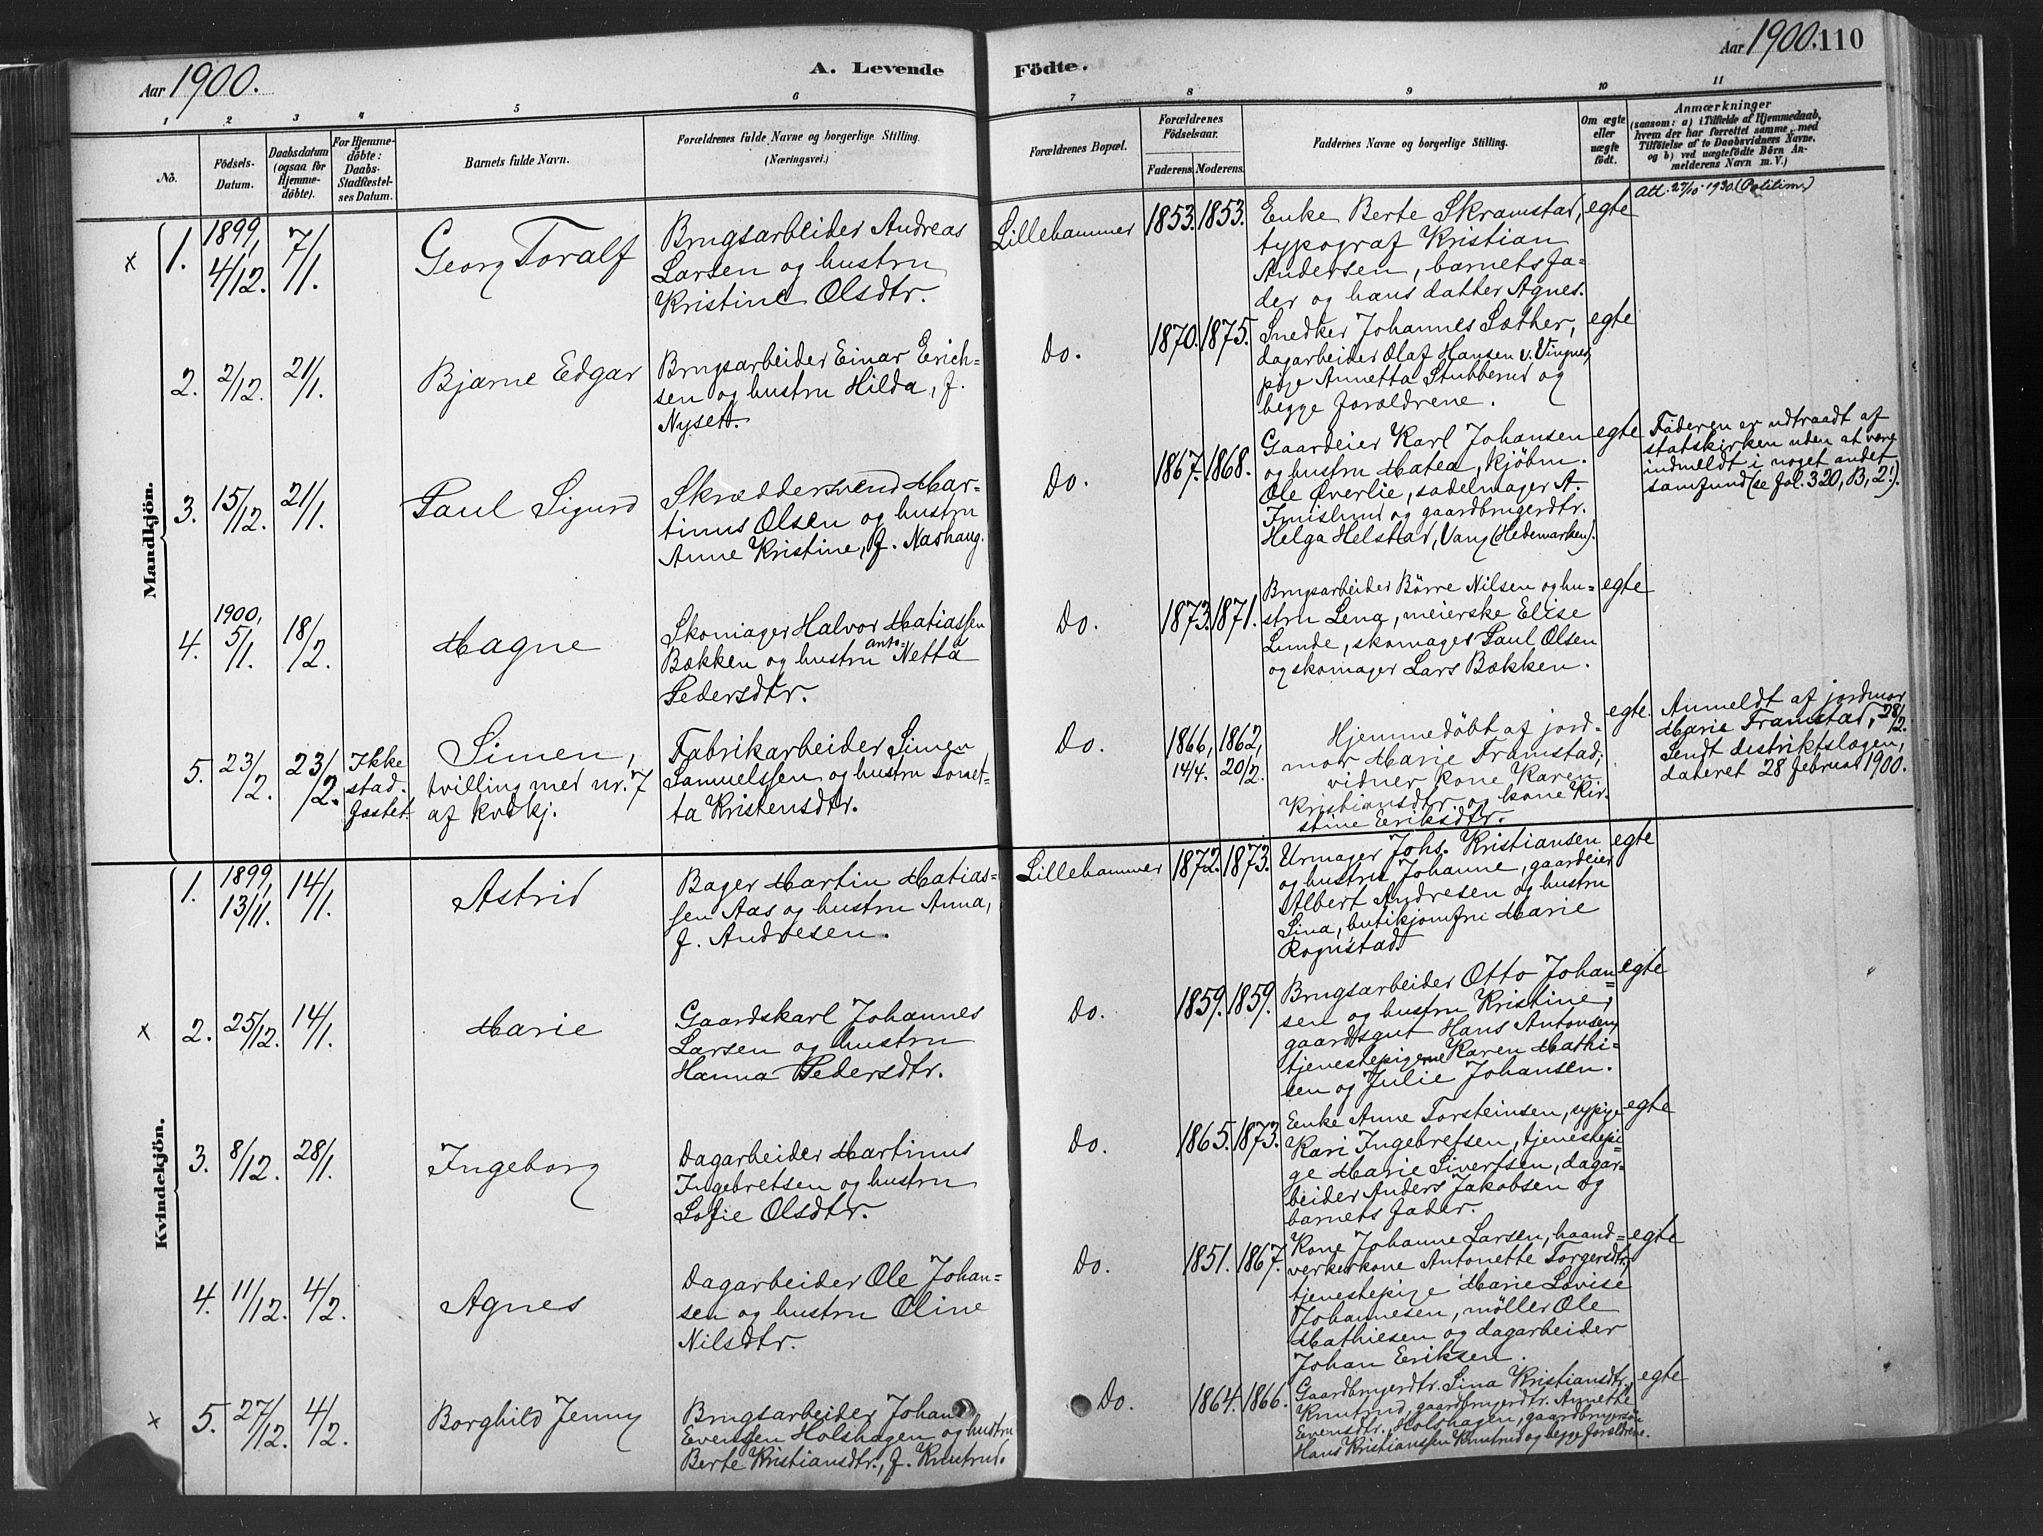 SAH, Fåberg prestekontor, Ministerialbok nr. 10, 1879-1900, s. 110